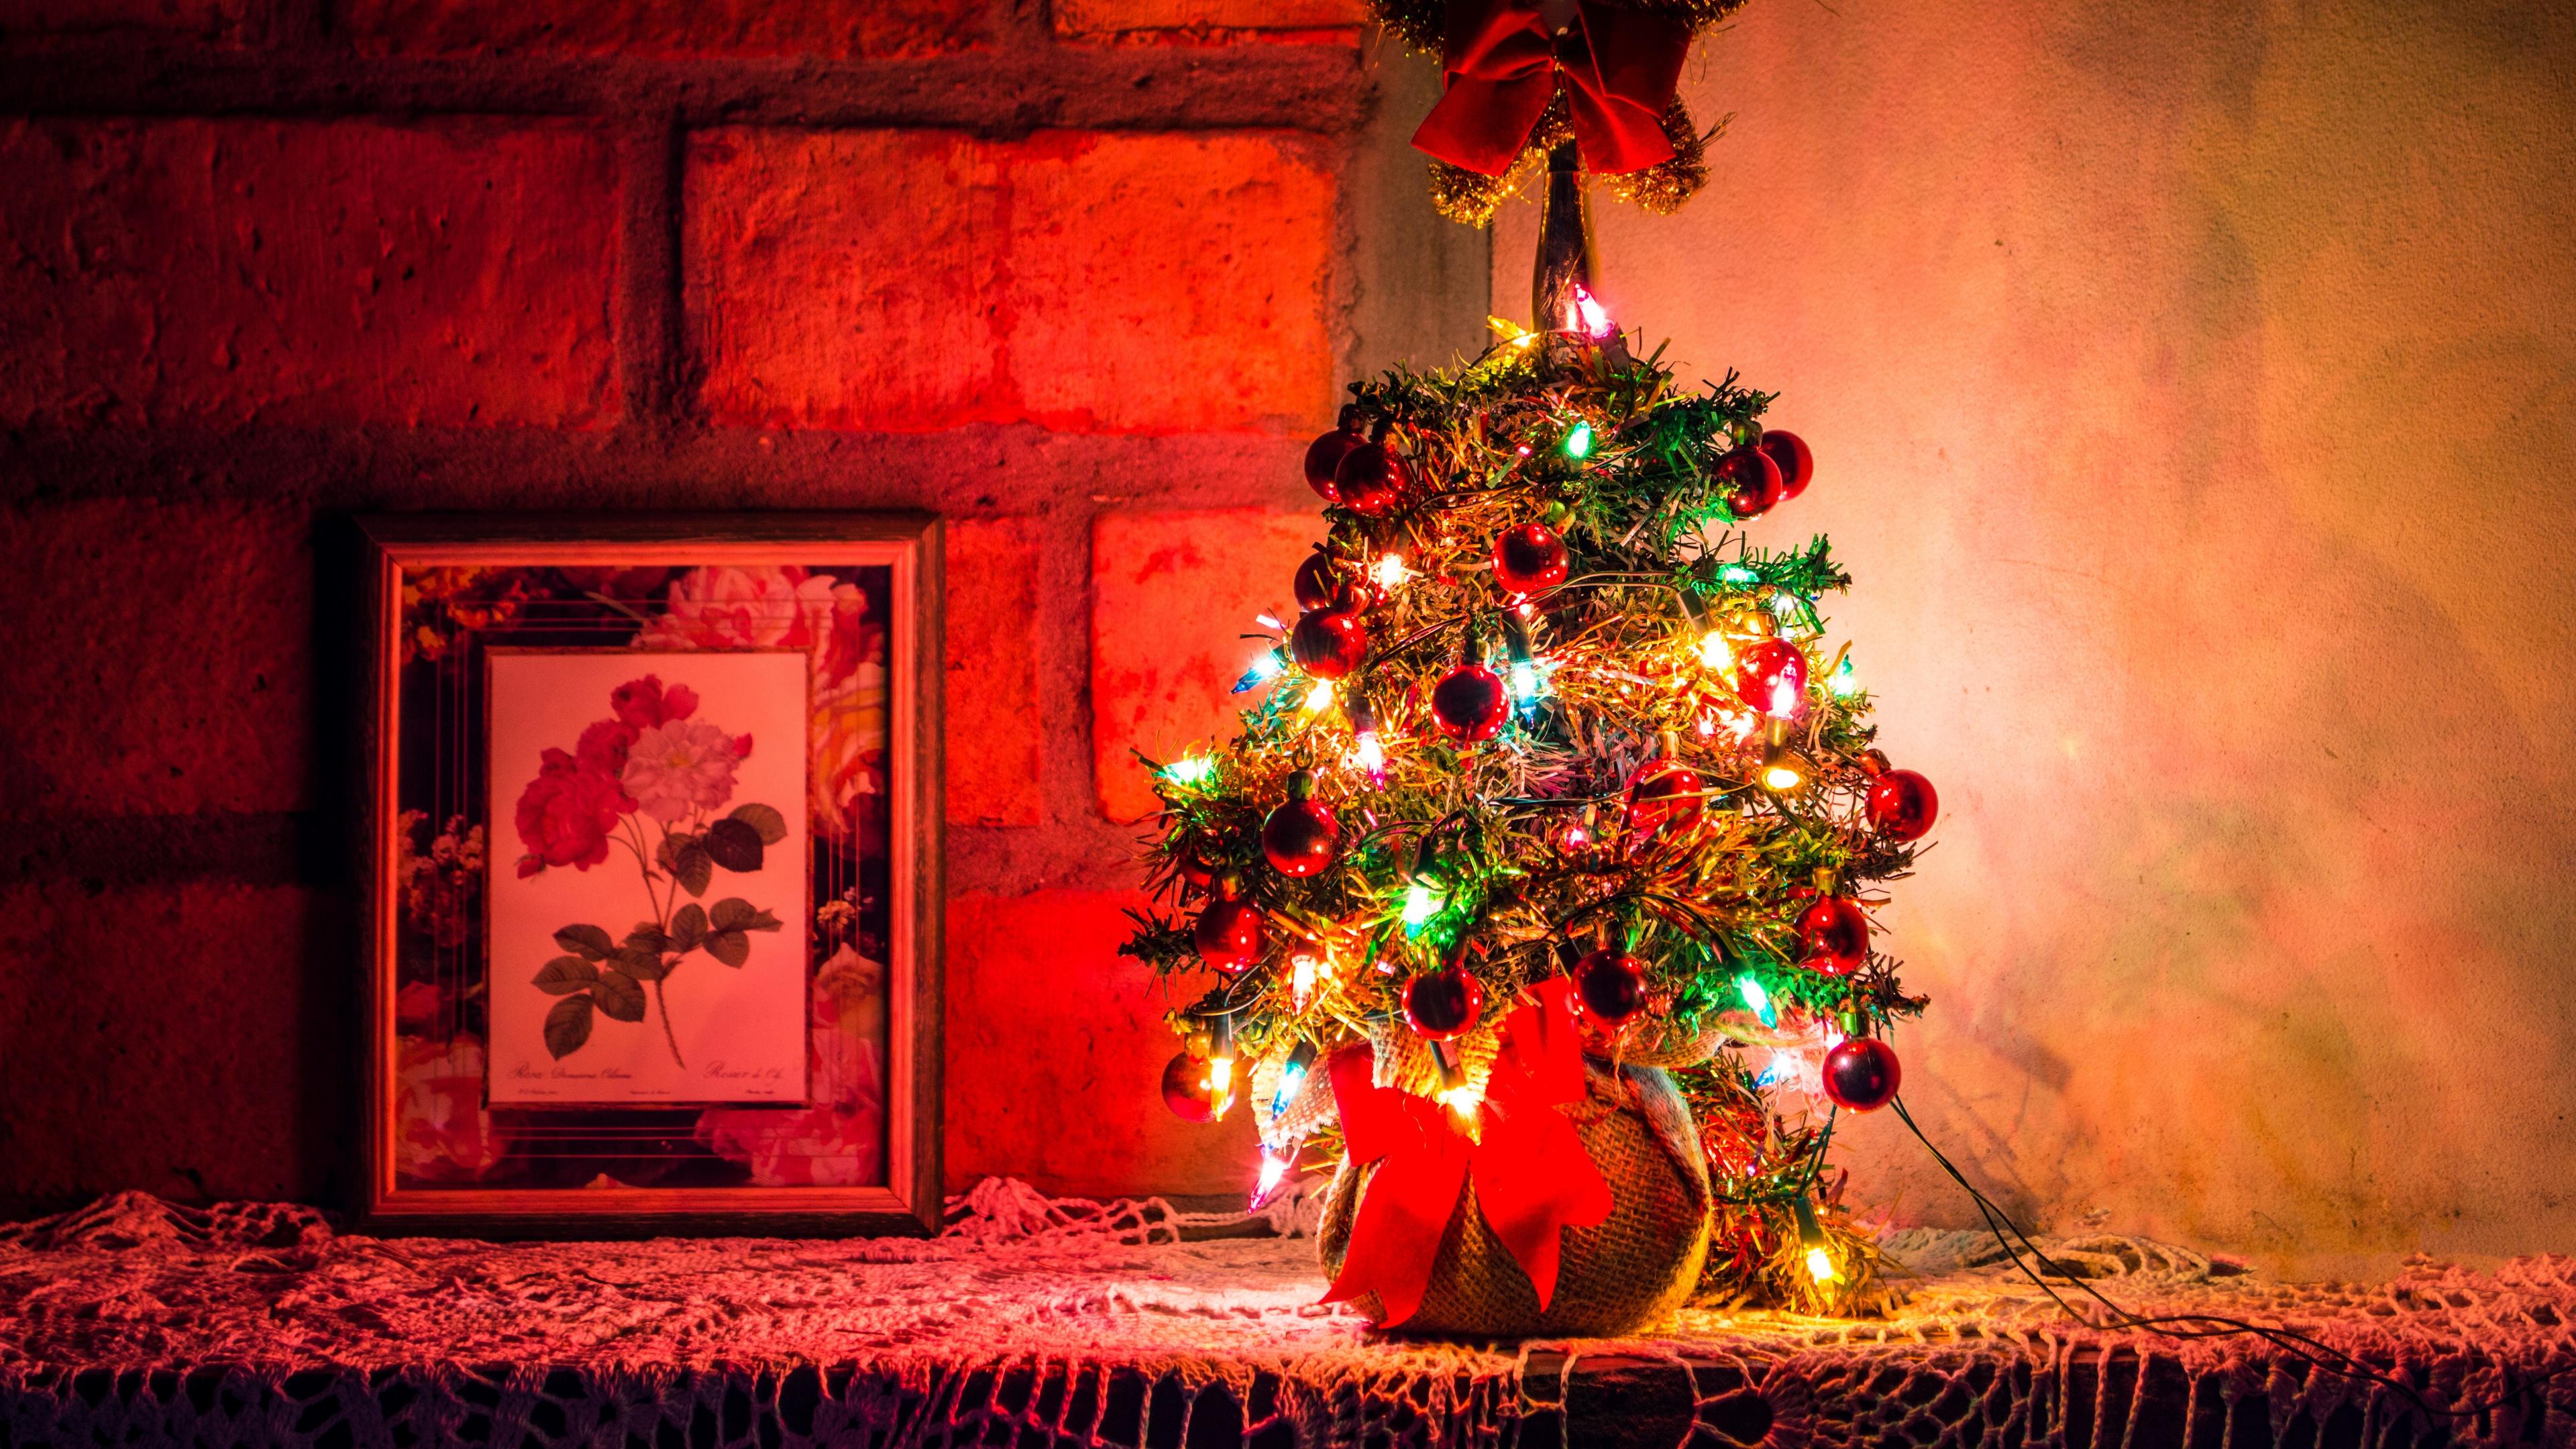 christmas tree new year christmas decoration garlands 4k 1538344992 - christmas tree, new year, christmas, decoration, garlands 4k - new year, christmas tree, Christmas